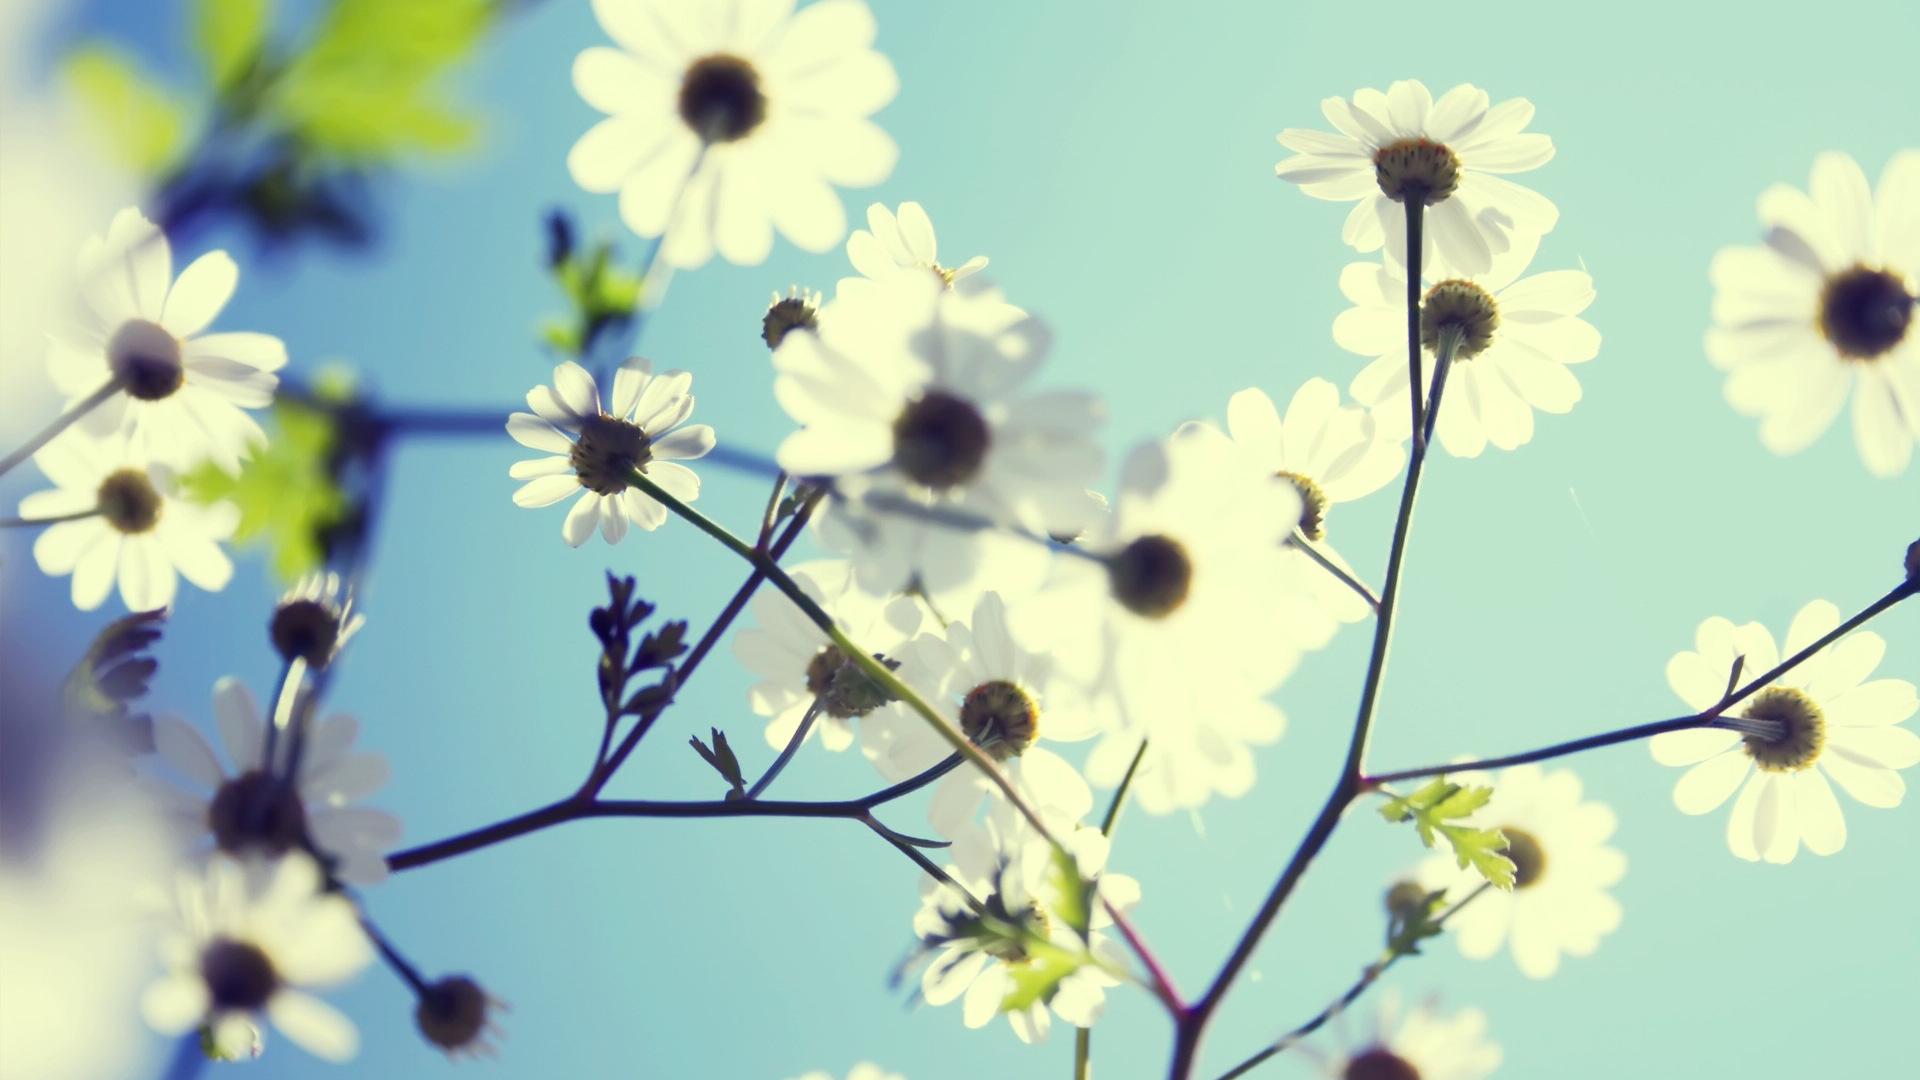 Flower Instagram wallpaper   617840 1920x1080